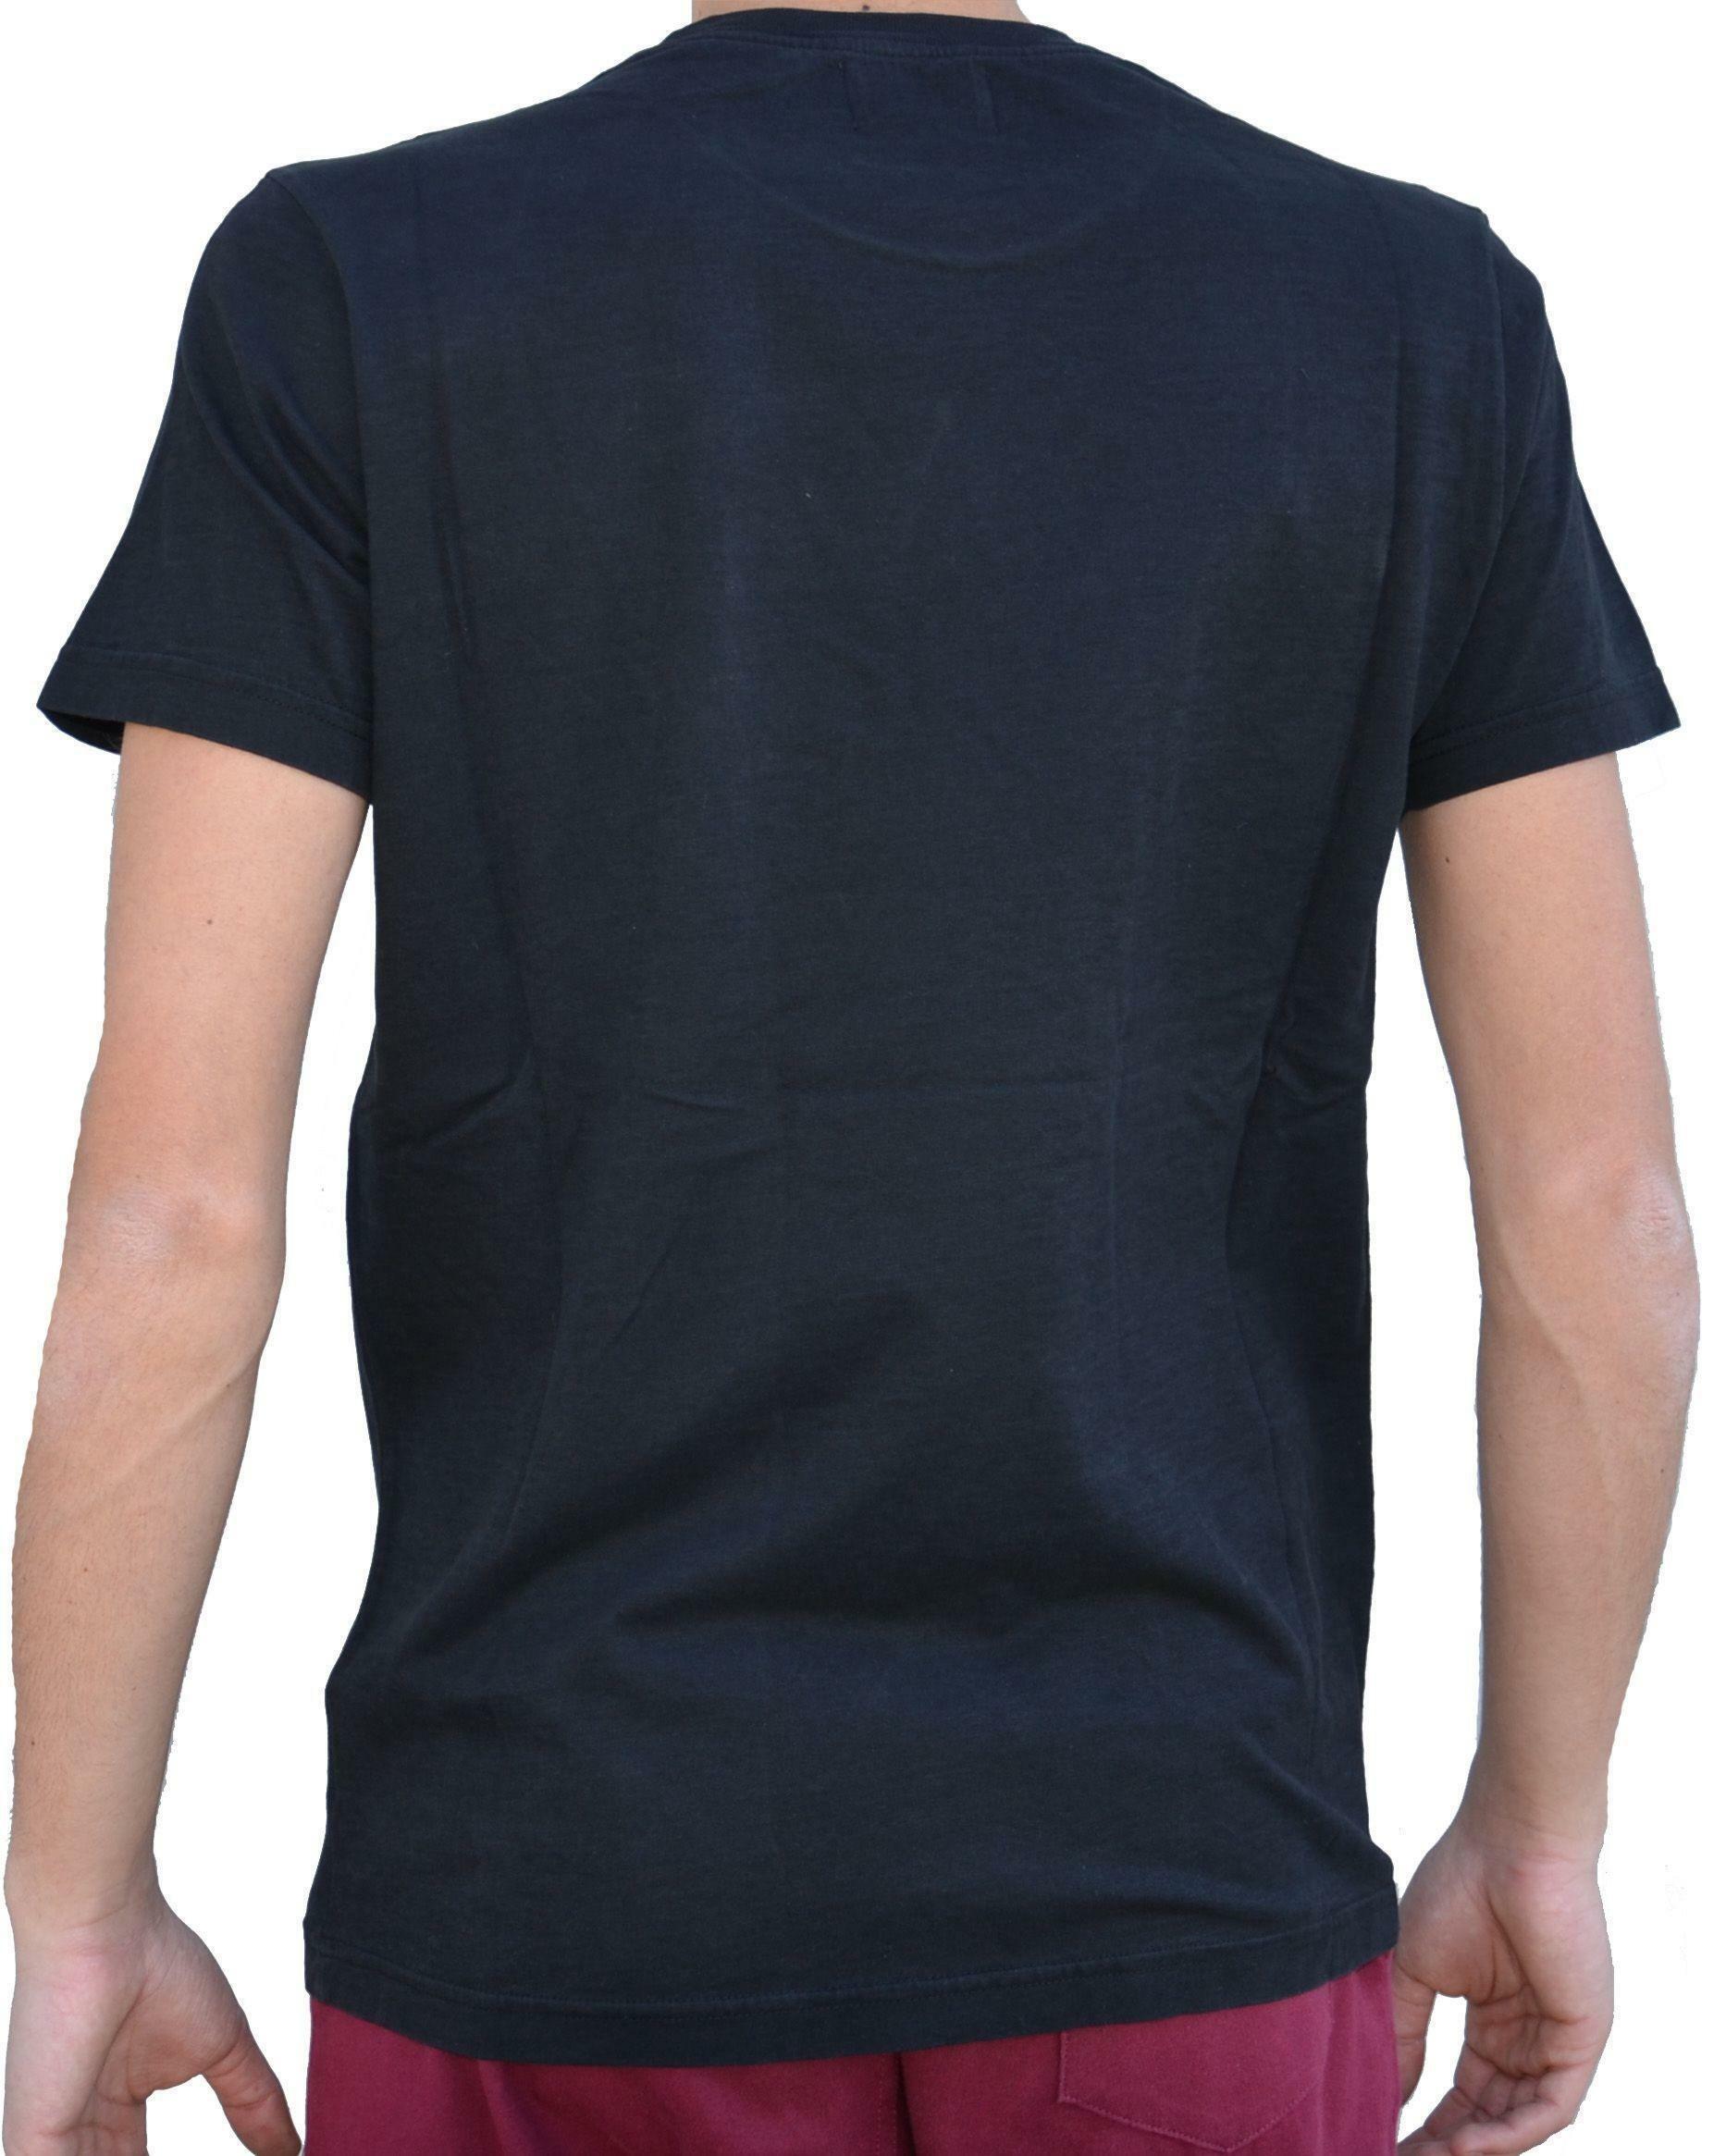 converse converse t-shirt logo uomo nera